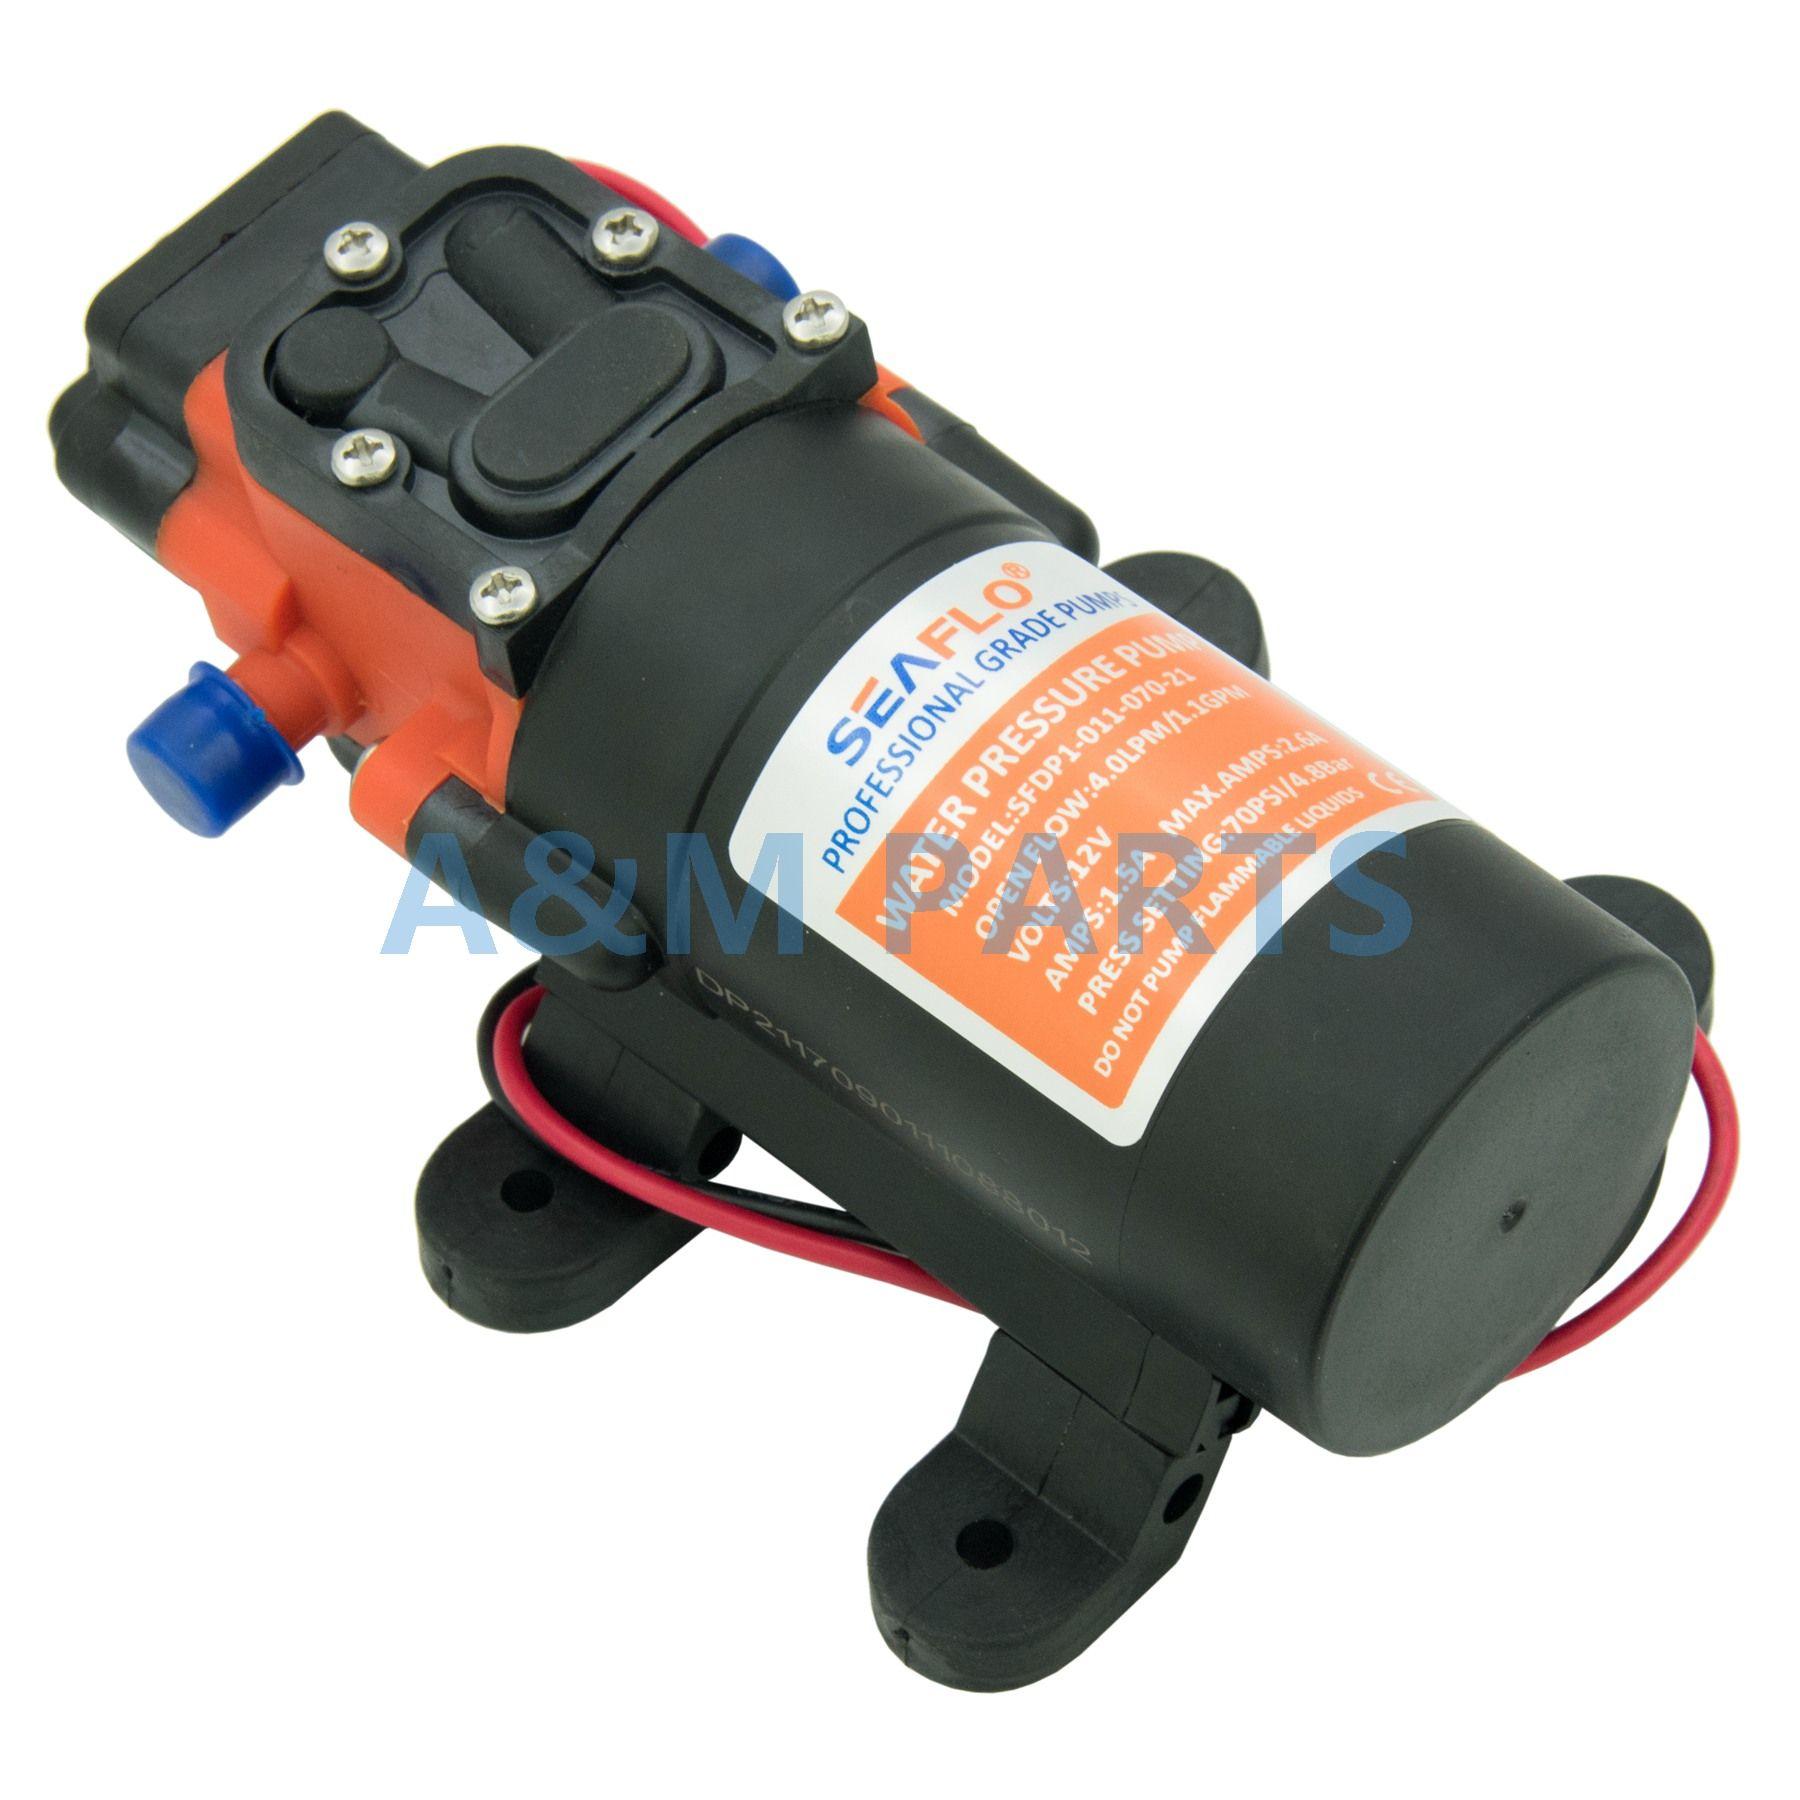 Marine Boat Diaphragm Water Pressure Self Priming Pump 12V 70PSI 1.1 GPM